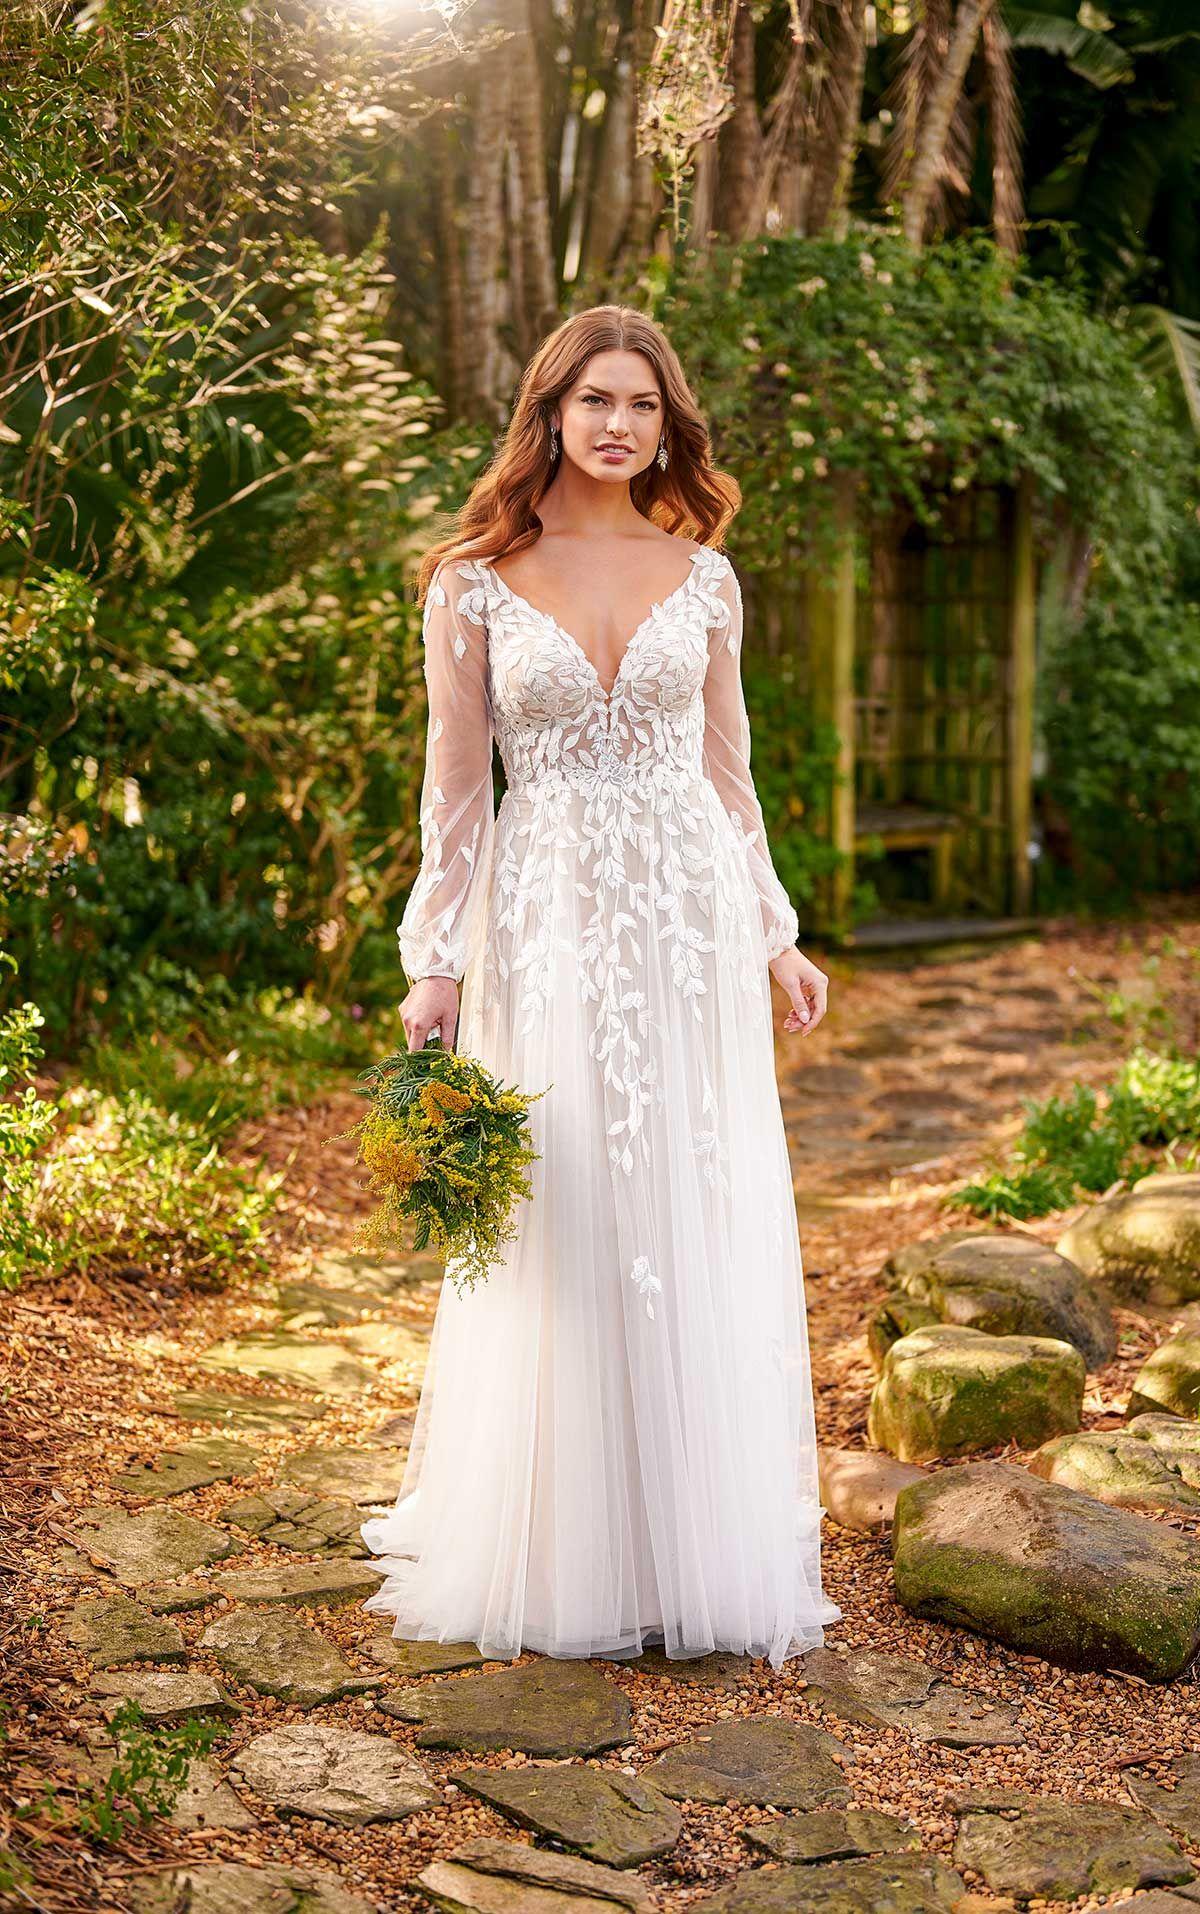 Sheer BohoStyle Wedding Dress with Bell Sleeves ALine